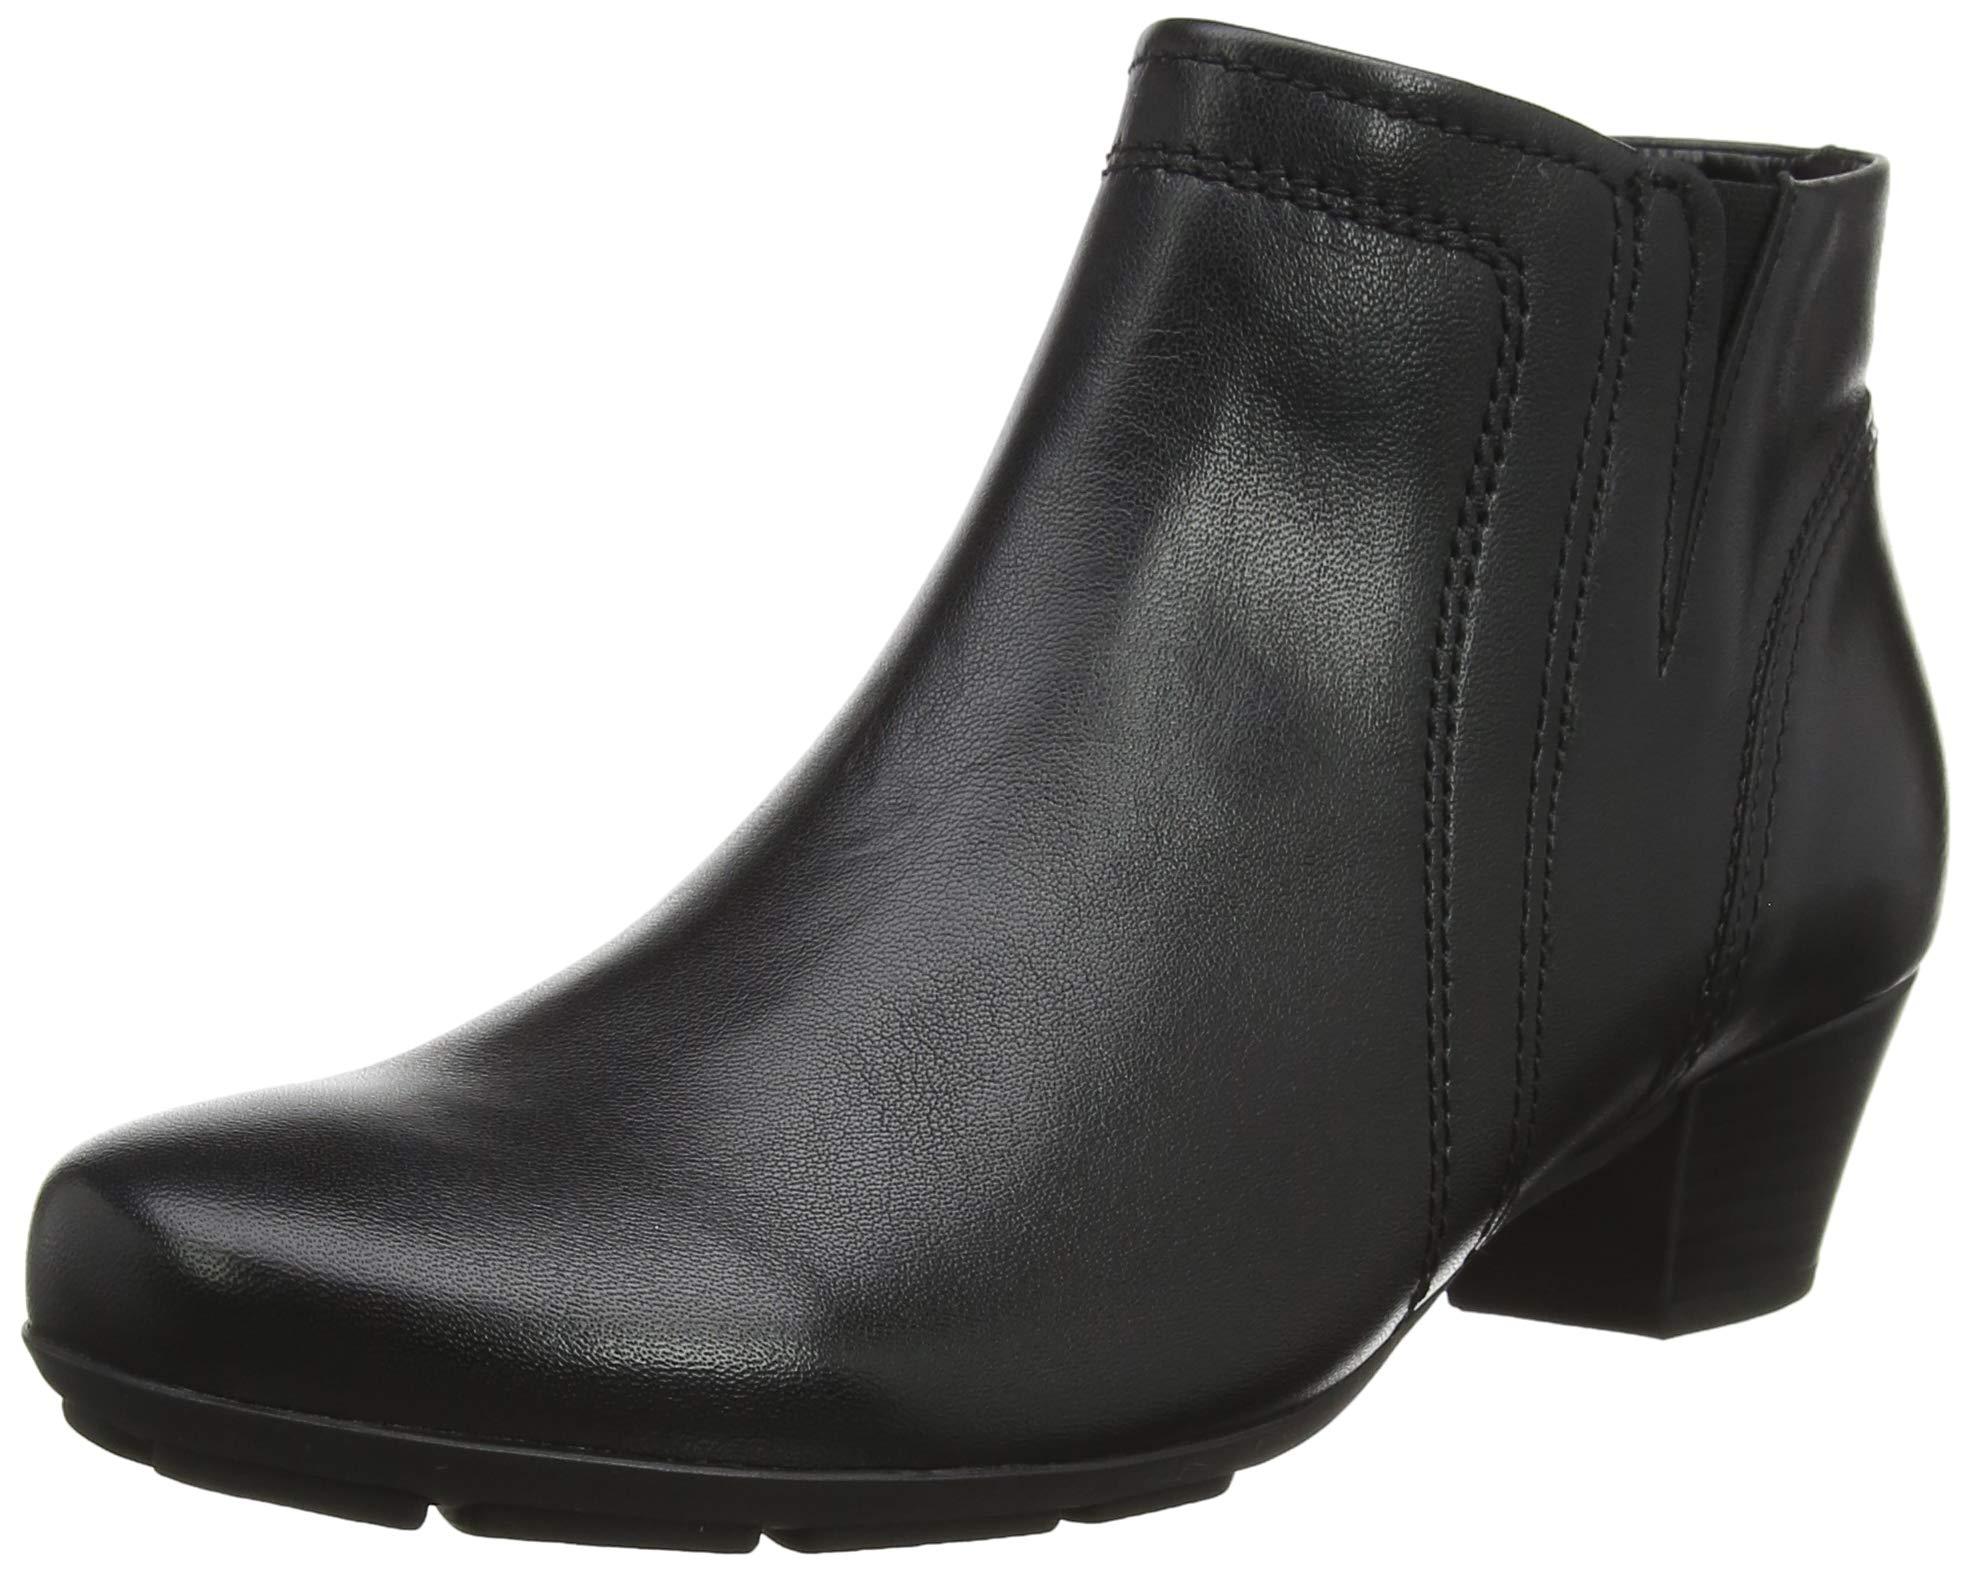 FemmeNoirschwarz BasicBotines Gabor Eu 2740 Shoes xtrdCshQ